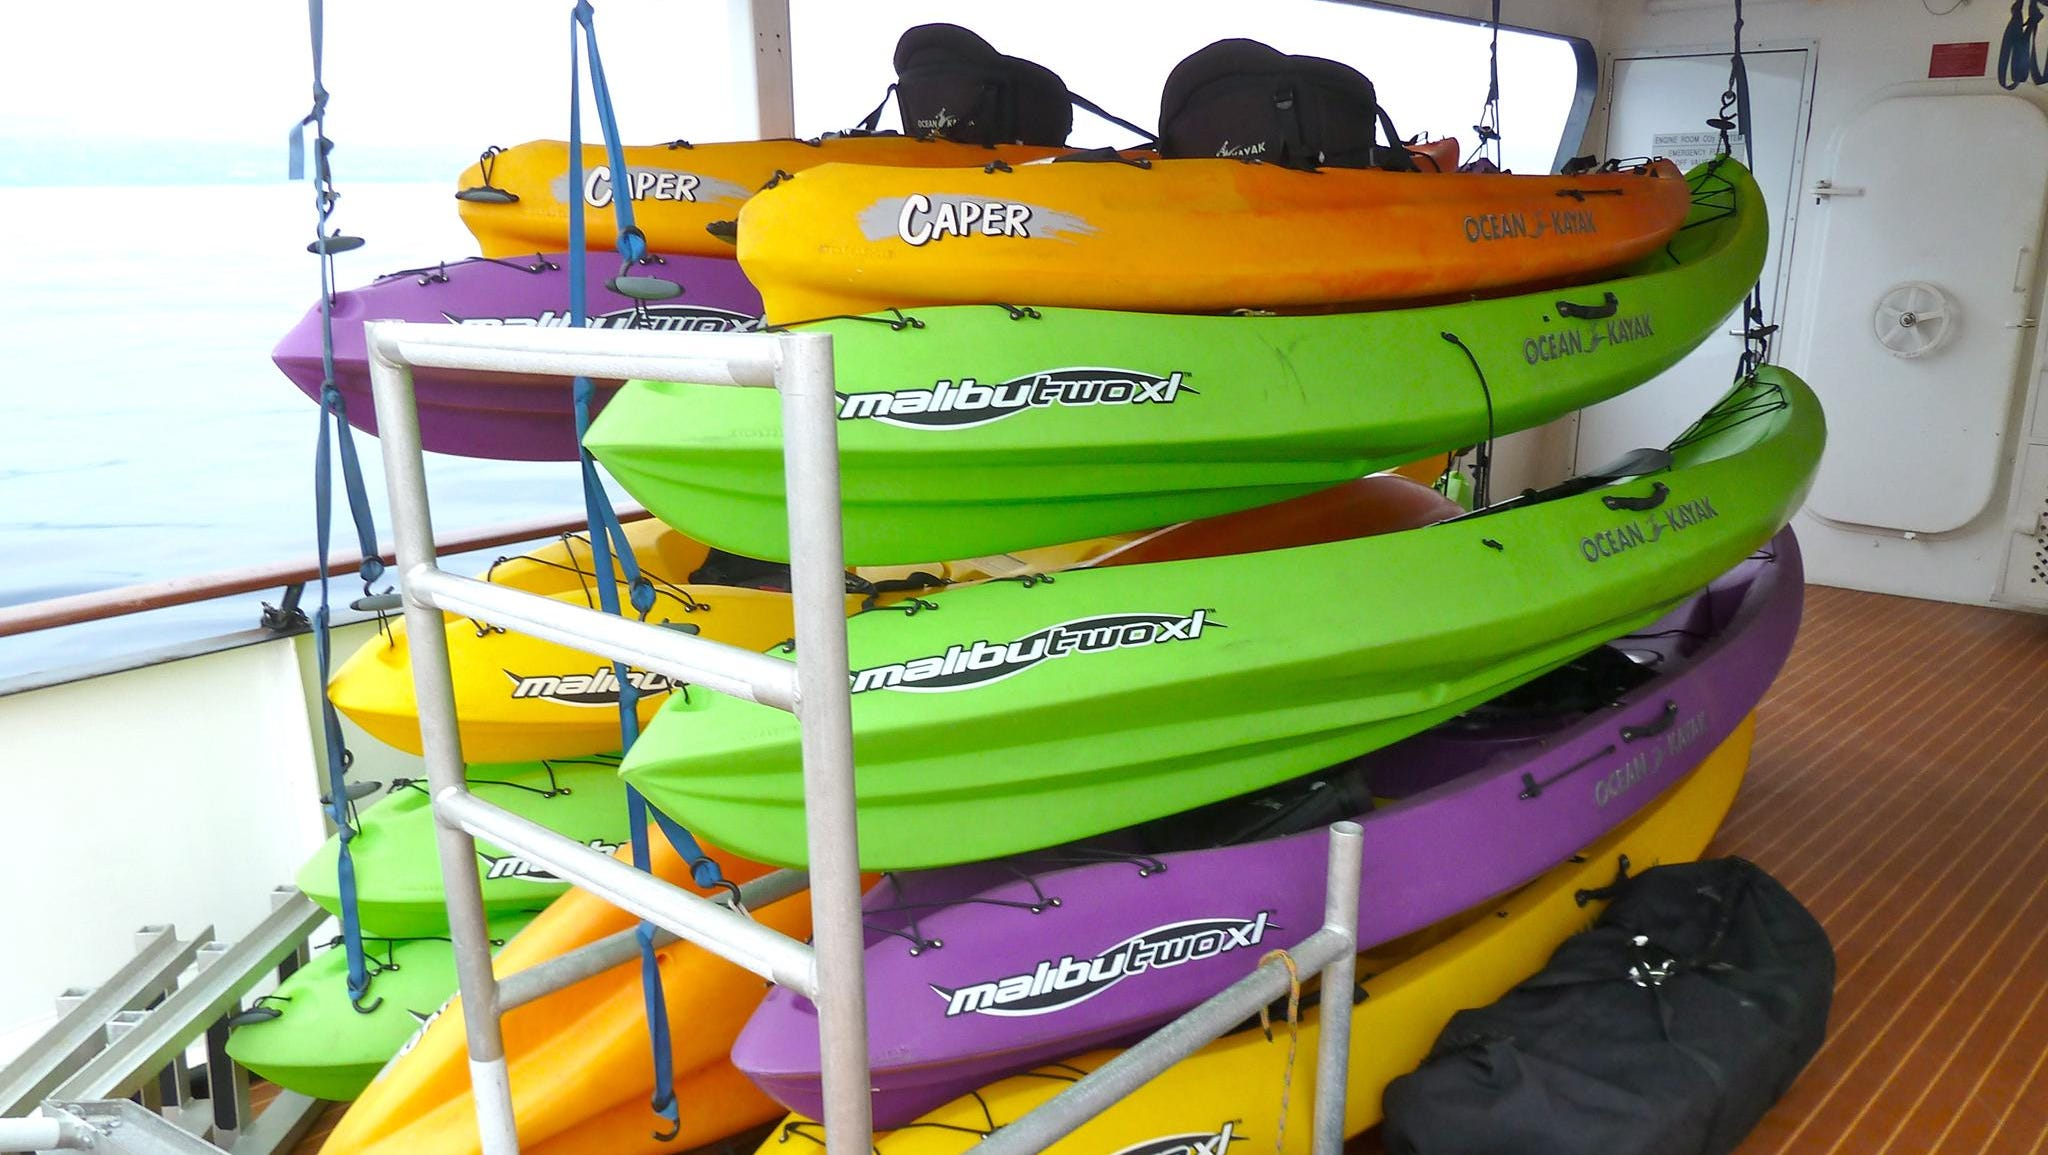 The Safari Explorer has a veritable fleet of sea kayaks for guests' use.